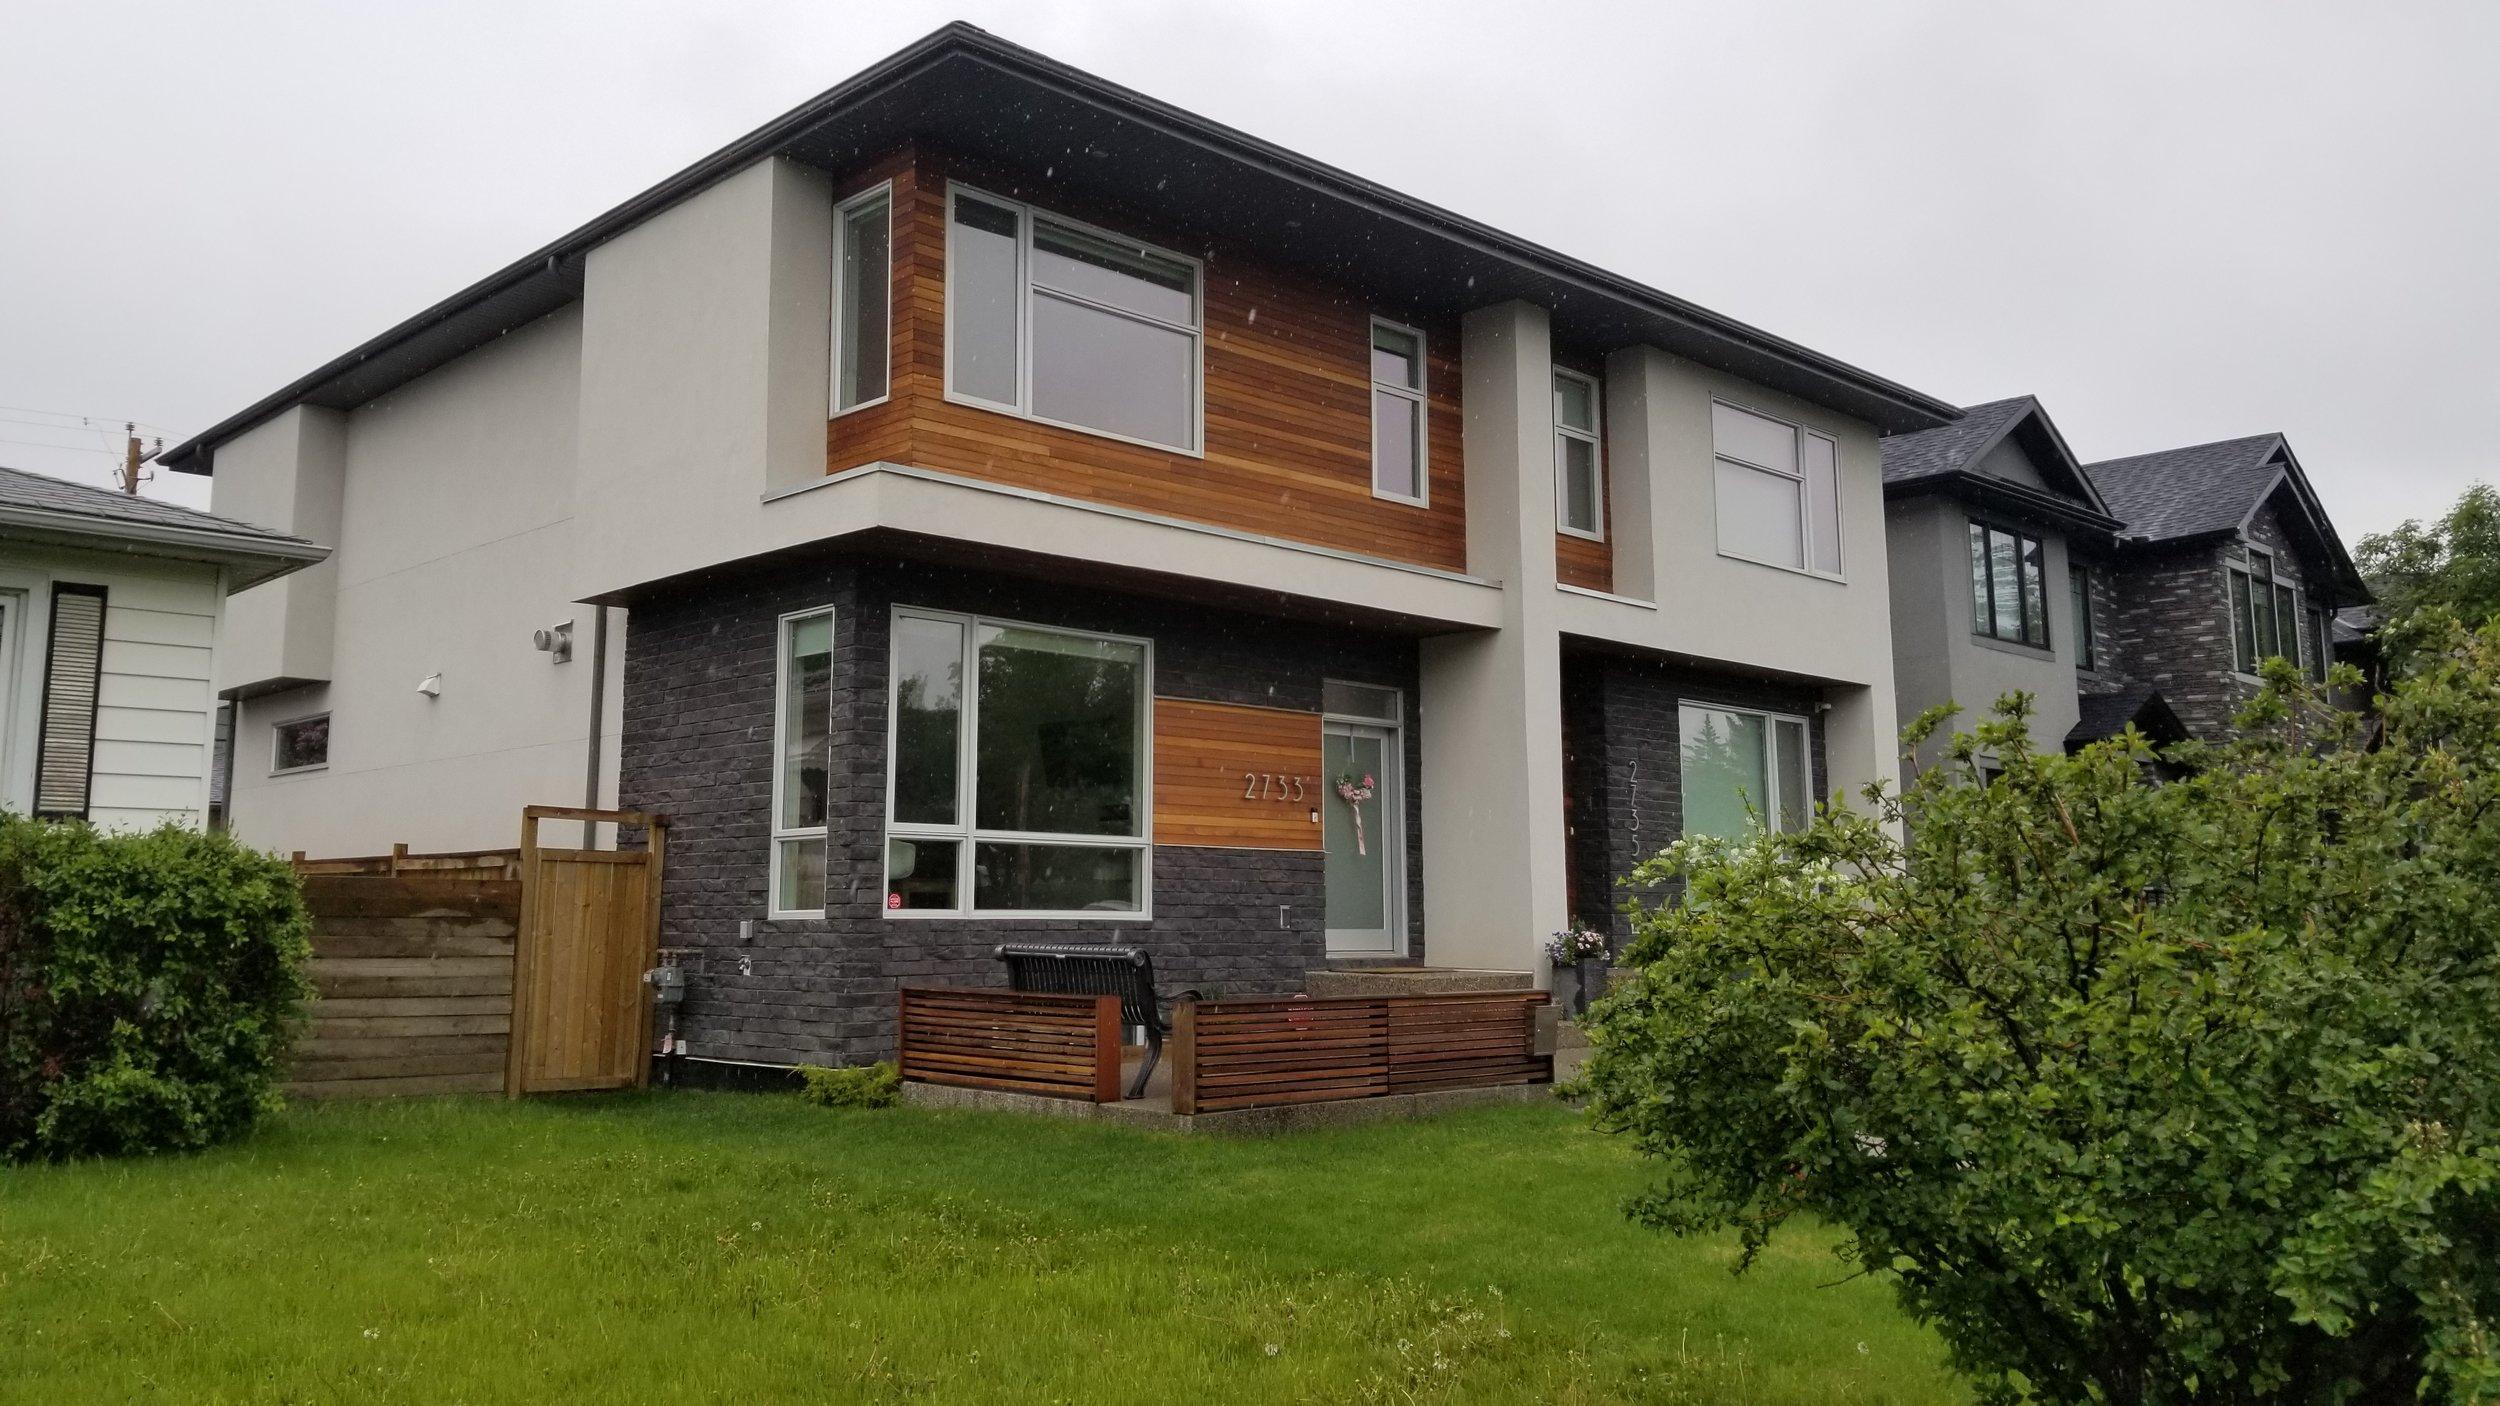 Glengarry, Calgary Home Inspection